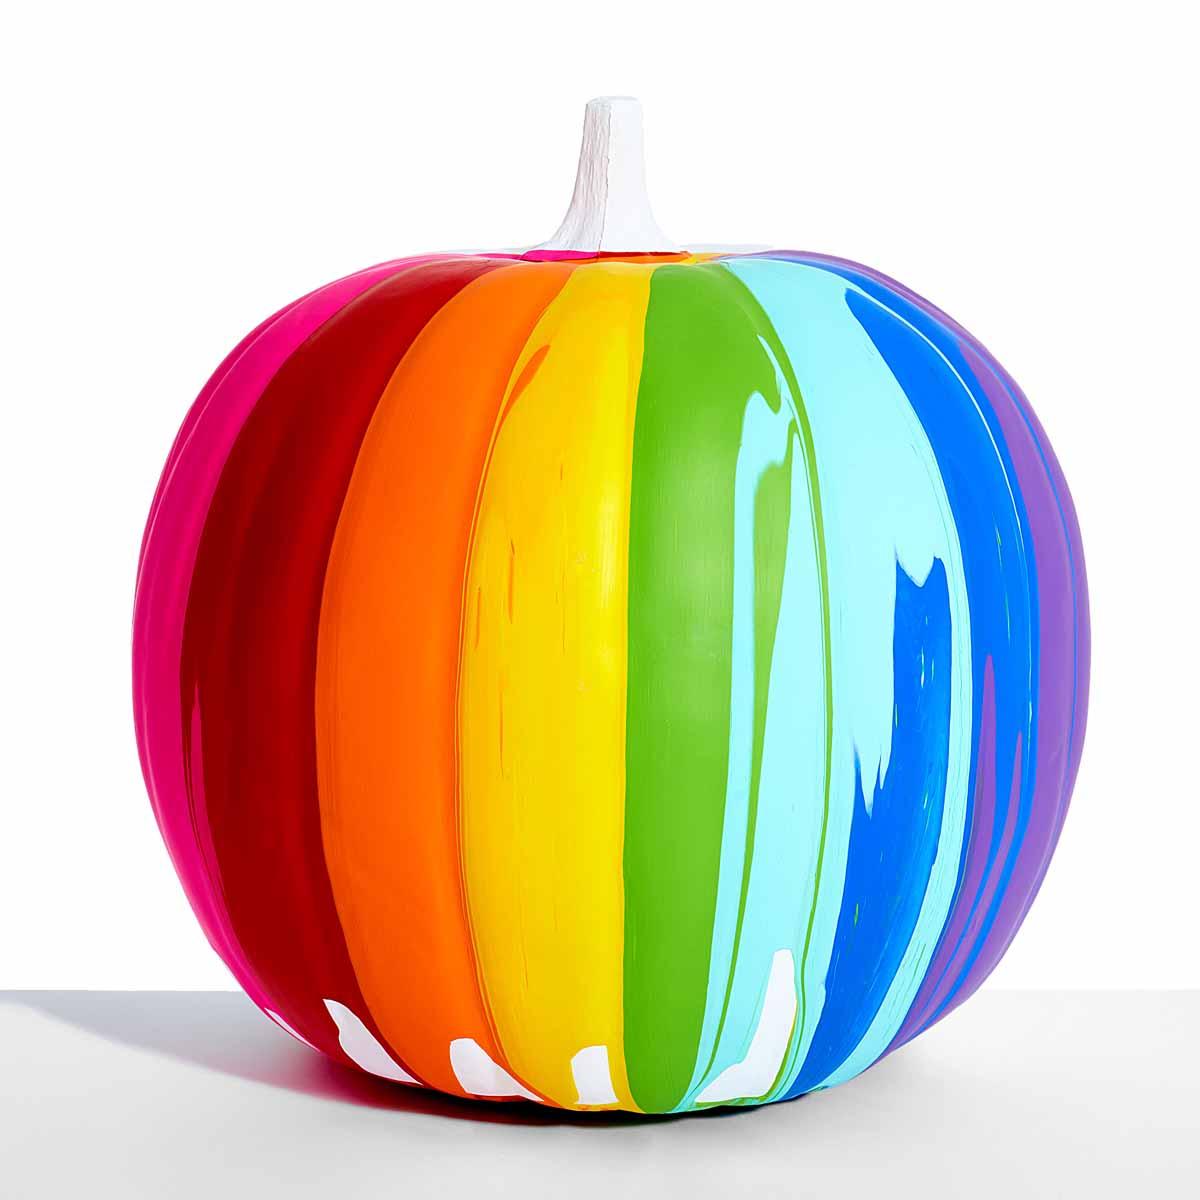 Apple Barrel Poured Pumpkin